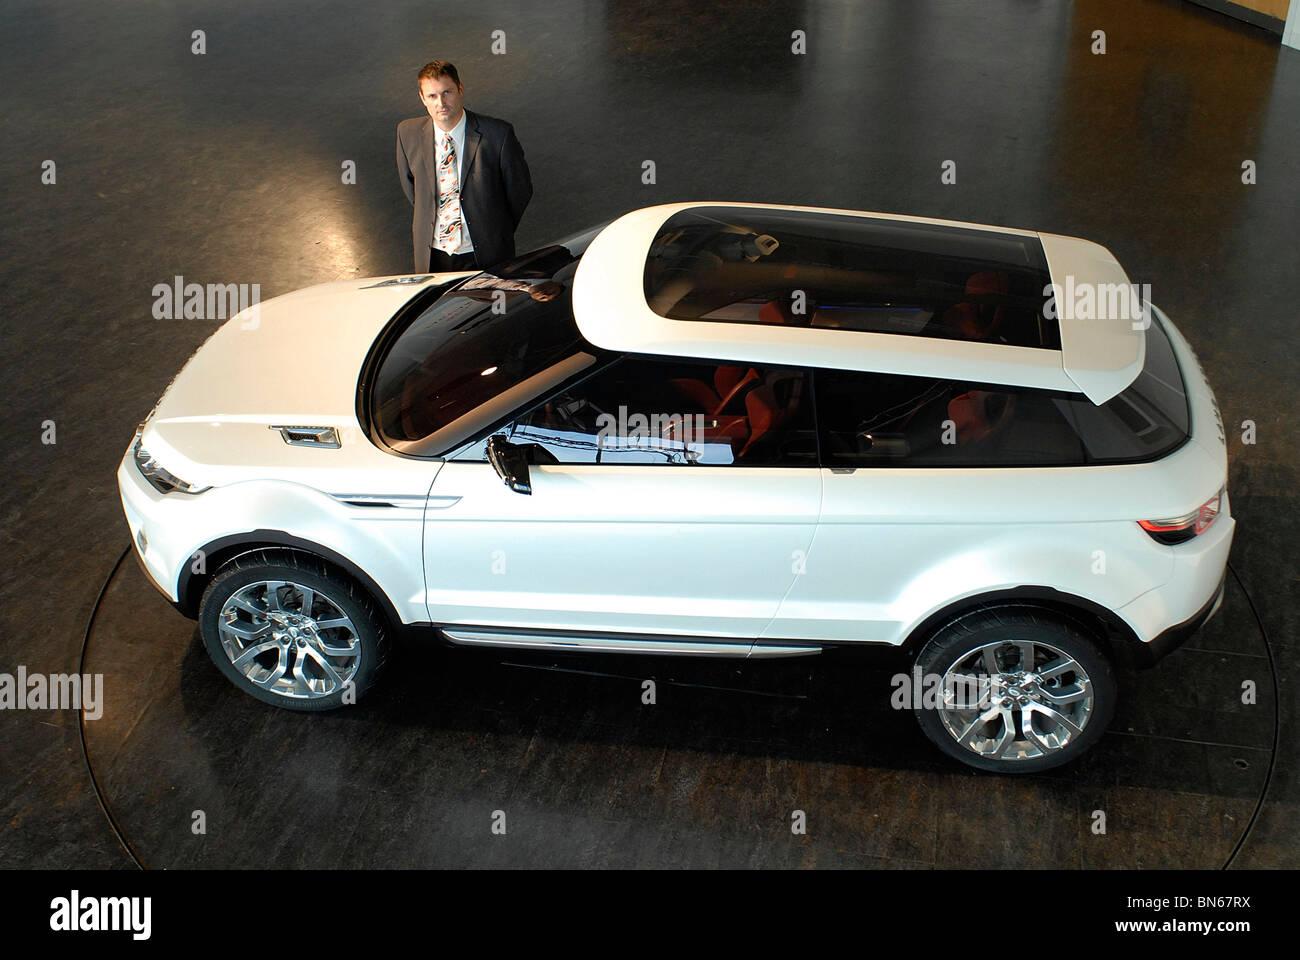 https://c7.alamy.com/comp/BN67RX/managing-director-phil-popham-with-the-land-rover-lrx-concept-car-BN67RX.jpg